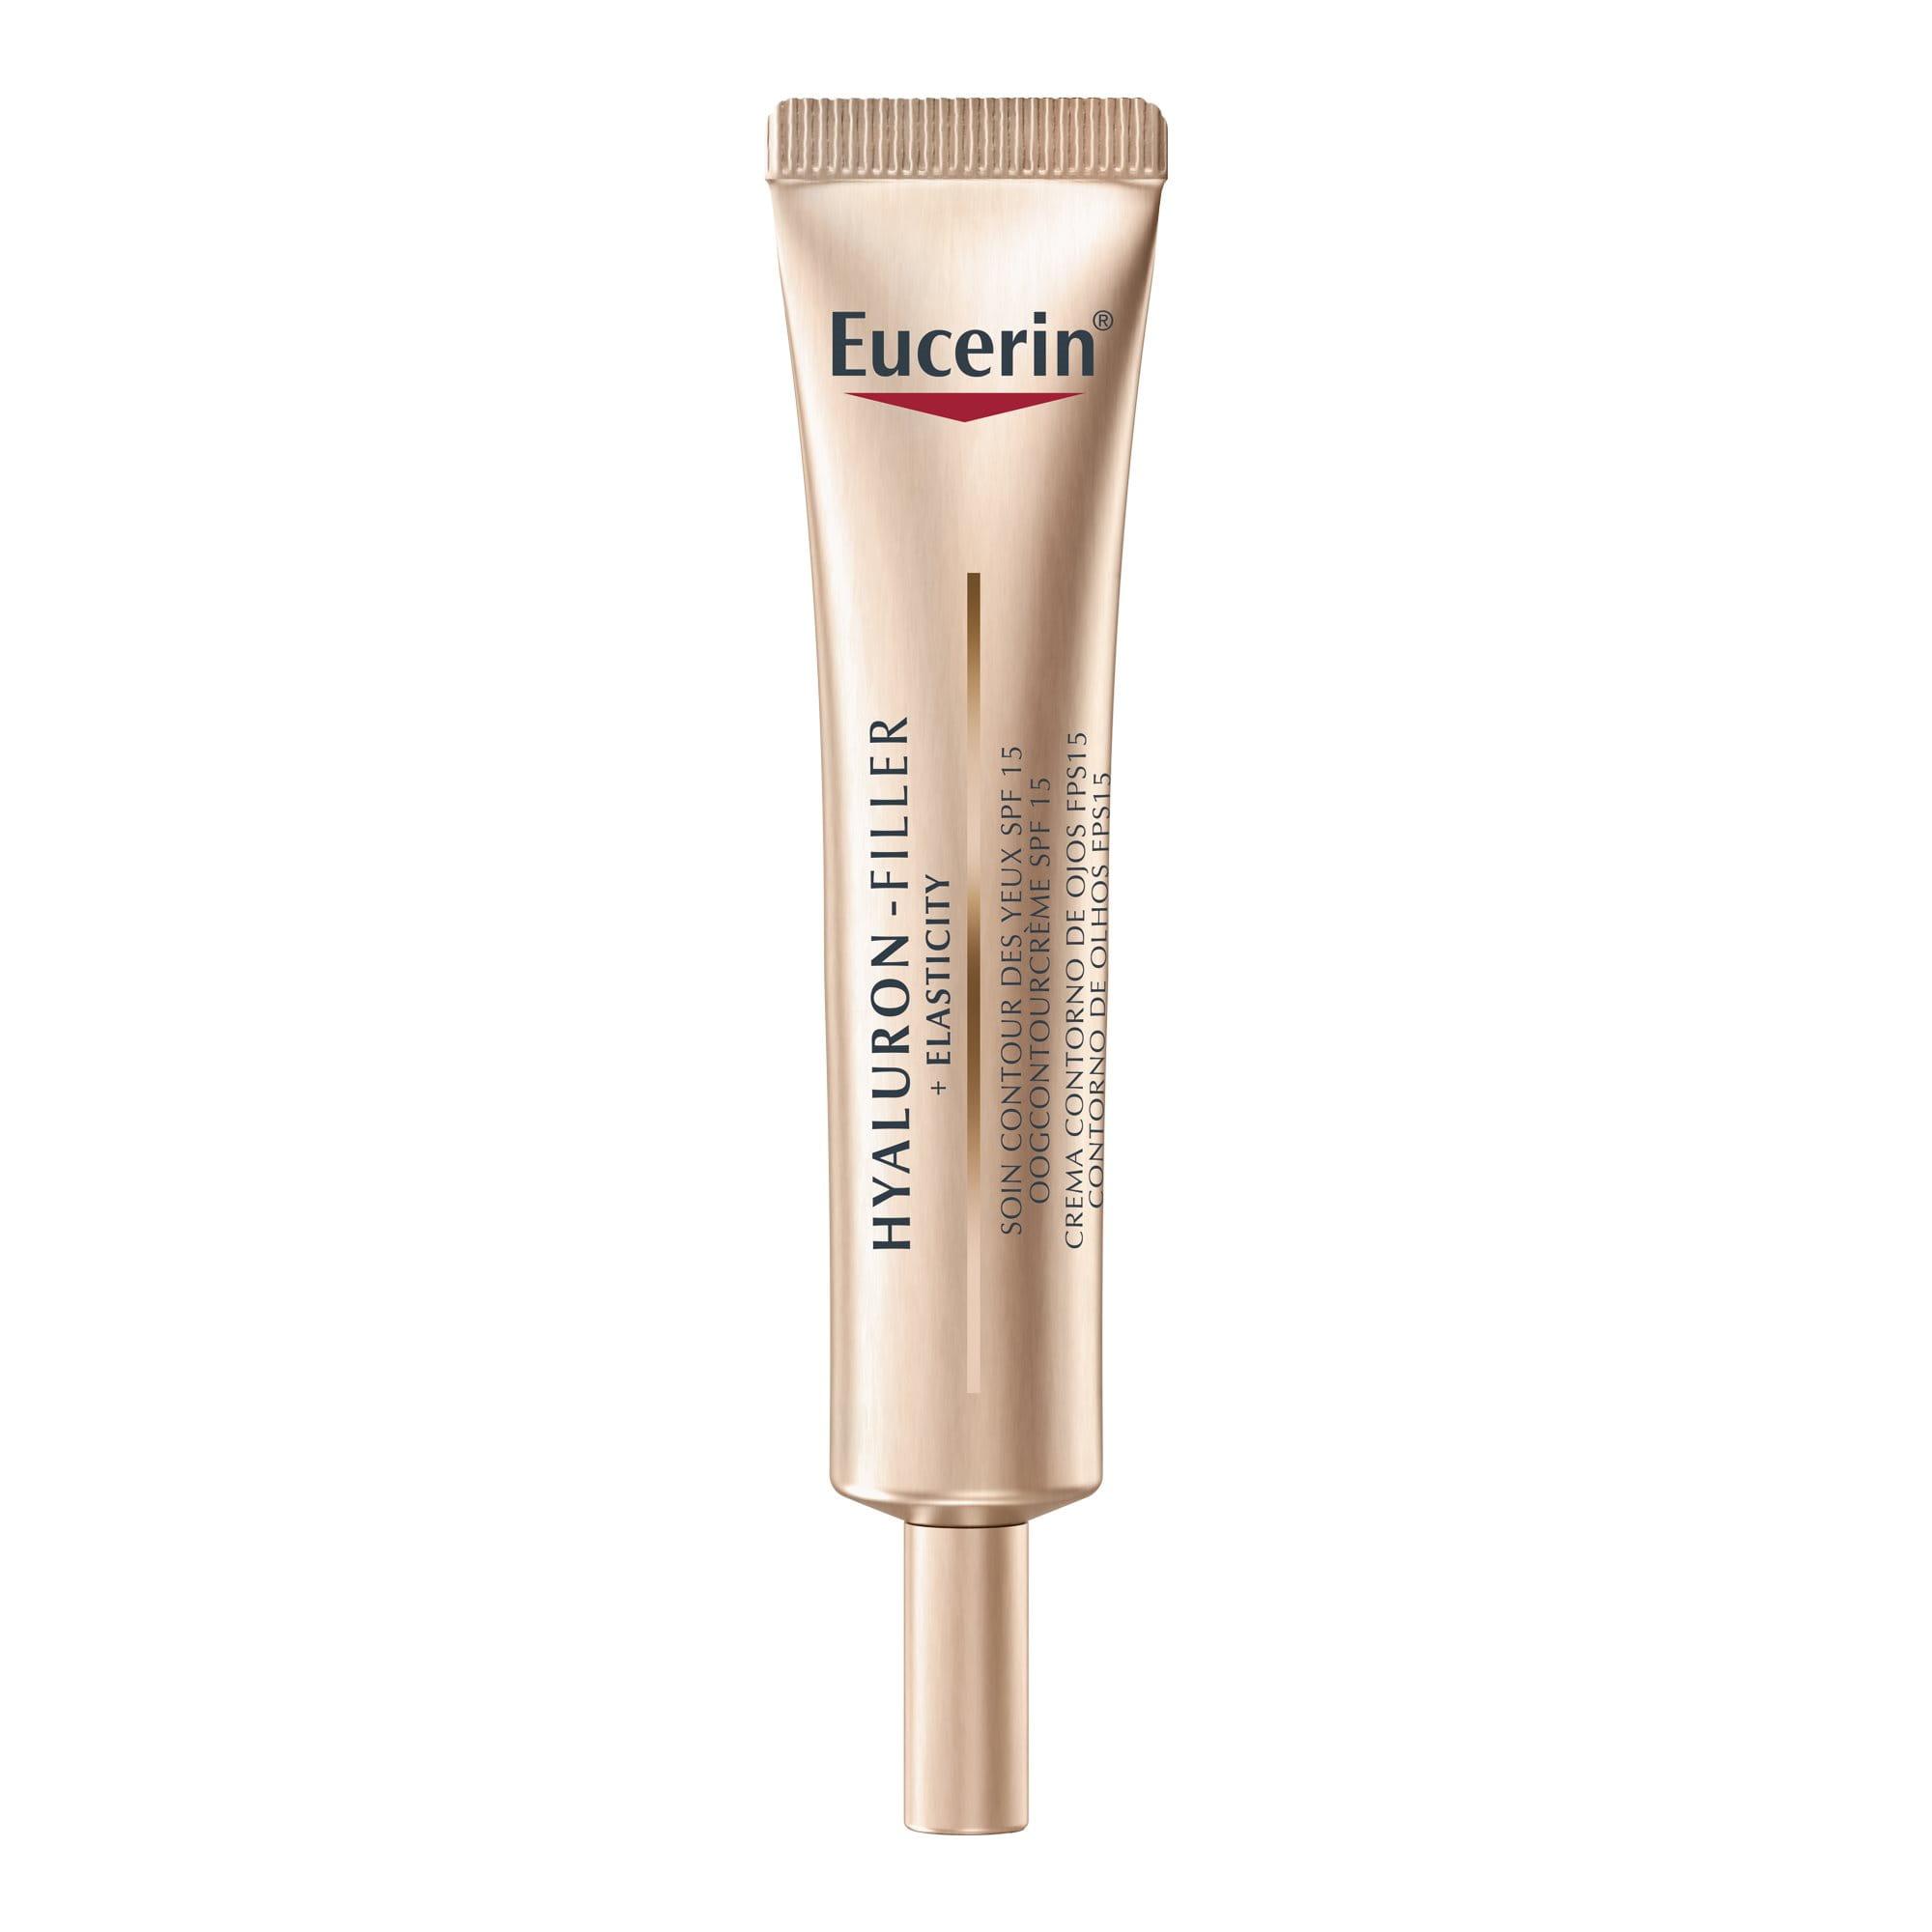 Eucerin Hyaluron-Filler + Elasticity Contorno de Ojos FPS 15